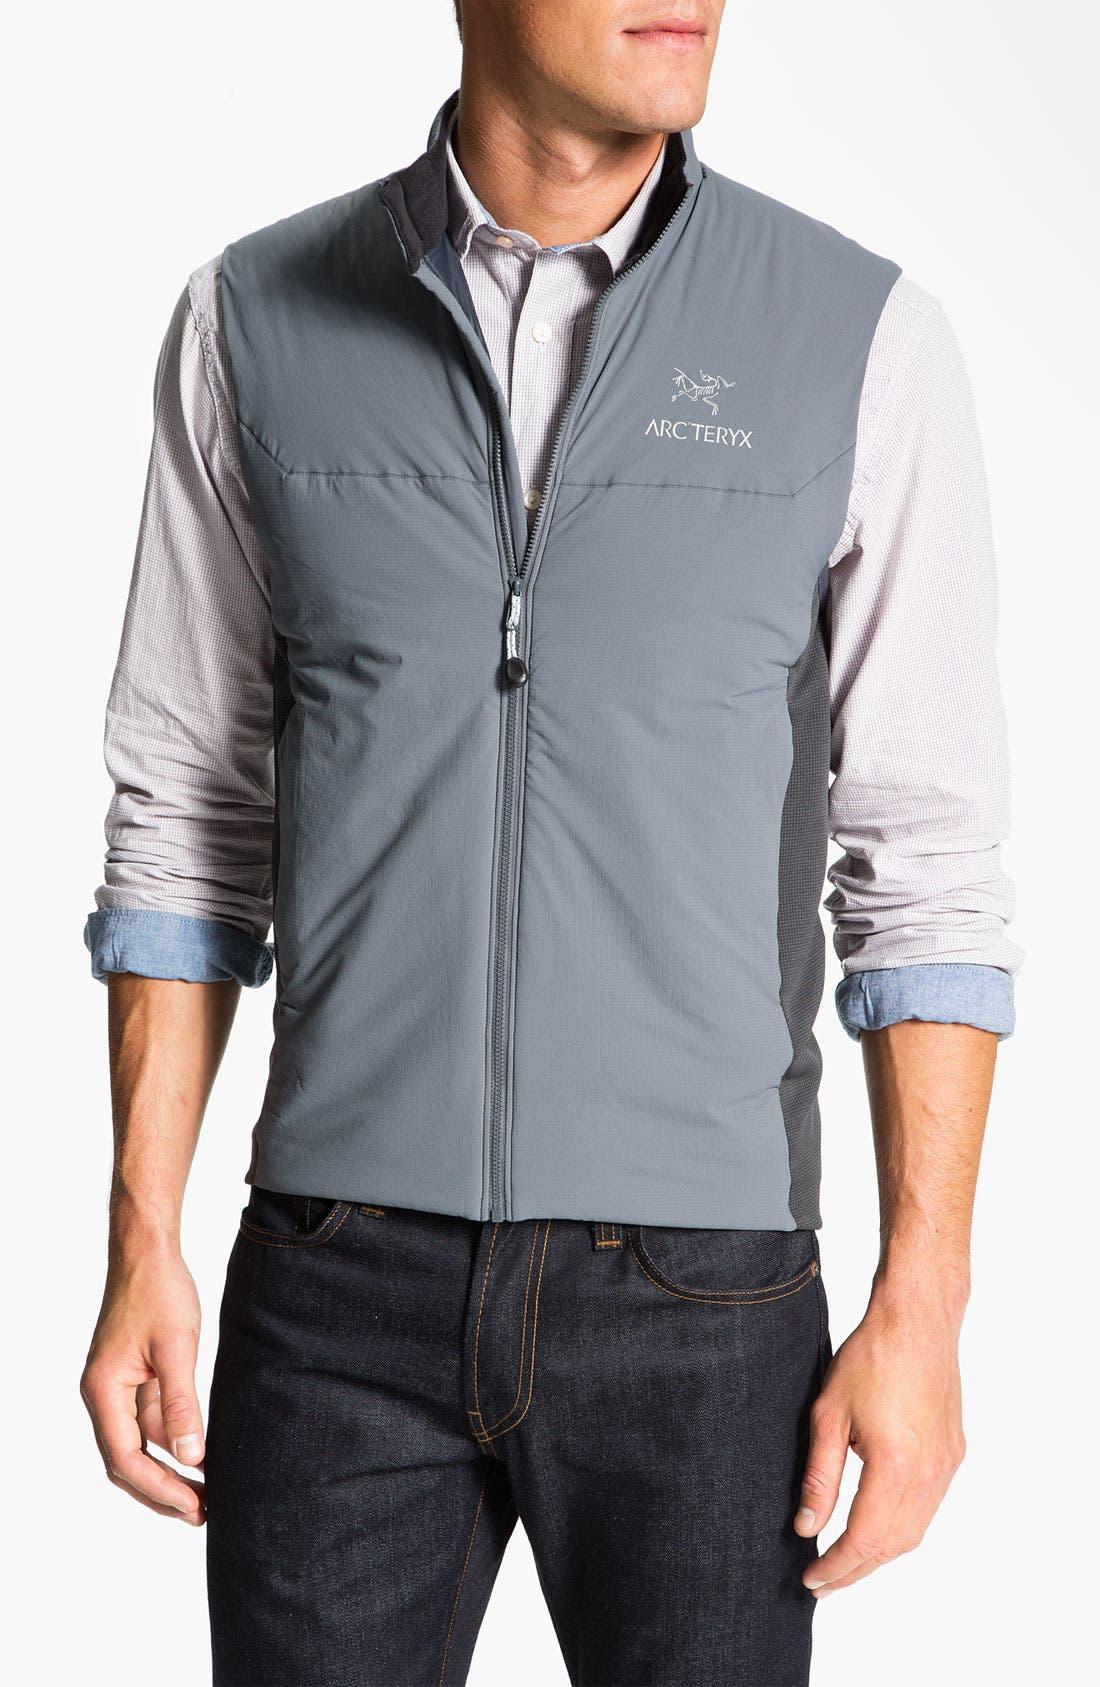 Main Image - Arc'teryx 'Atom LT' Vest